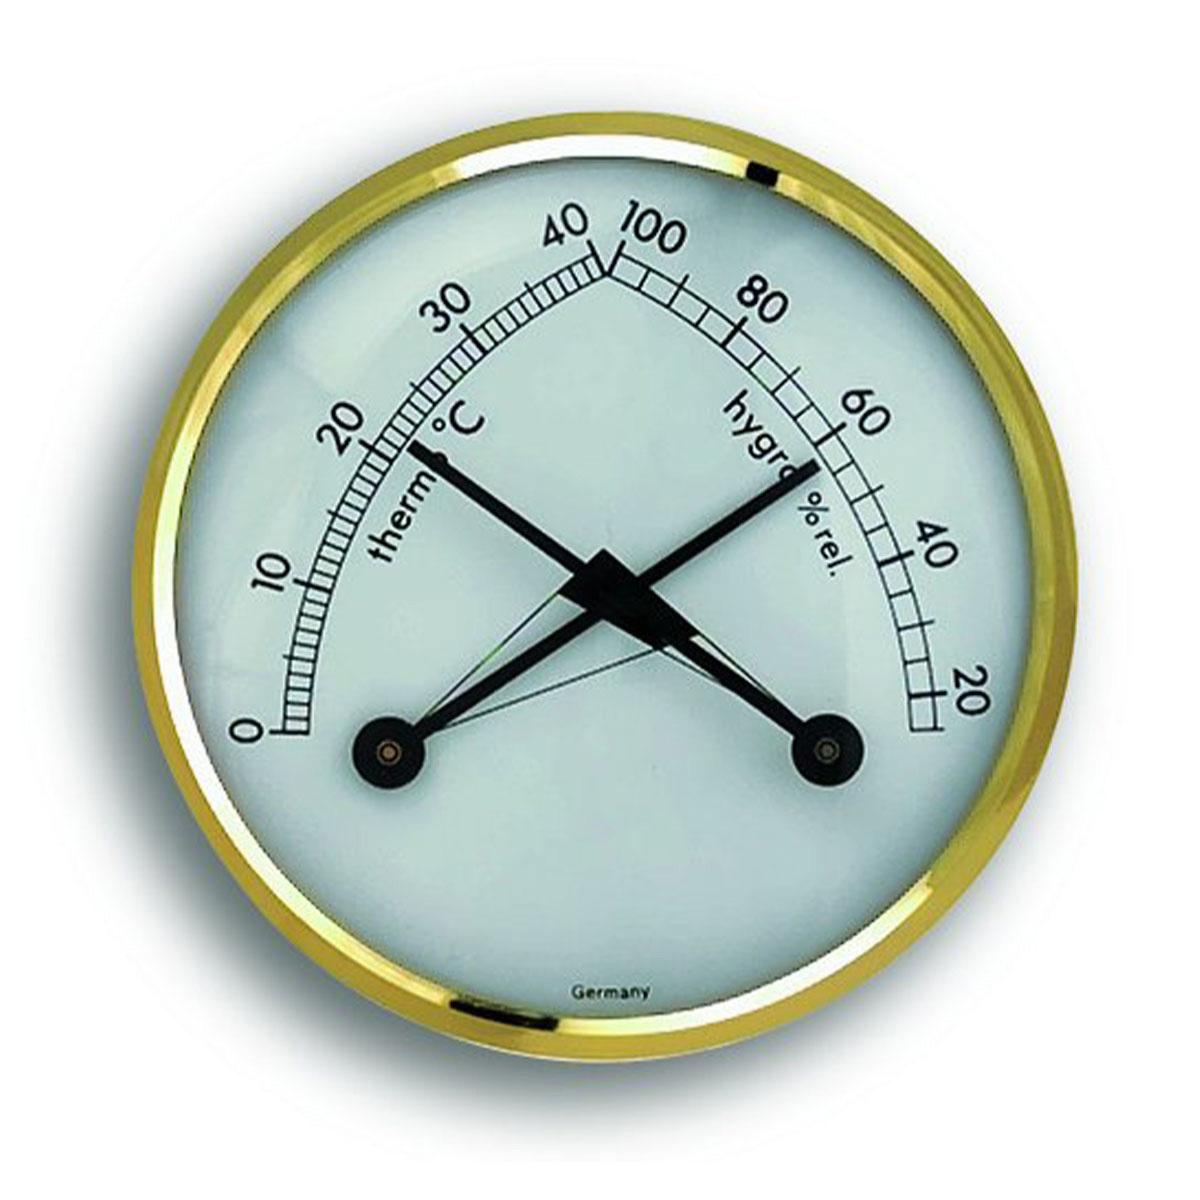 45-2006-analoges-thermo-hygrometer-klimatherm-1200x1200px.jpg